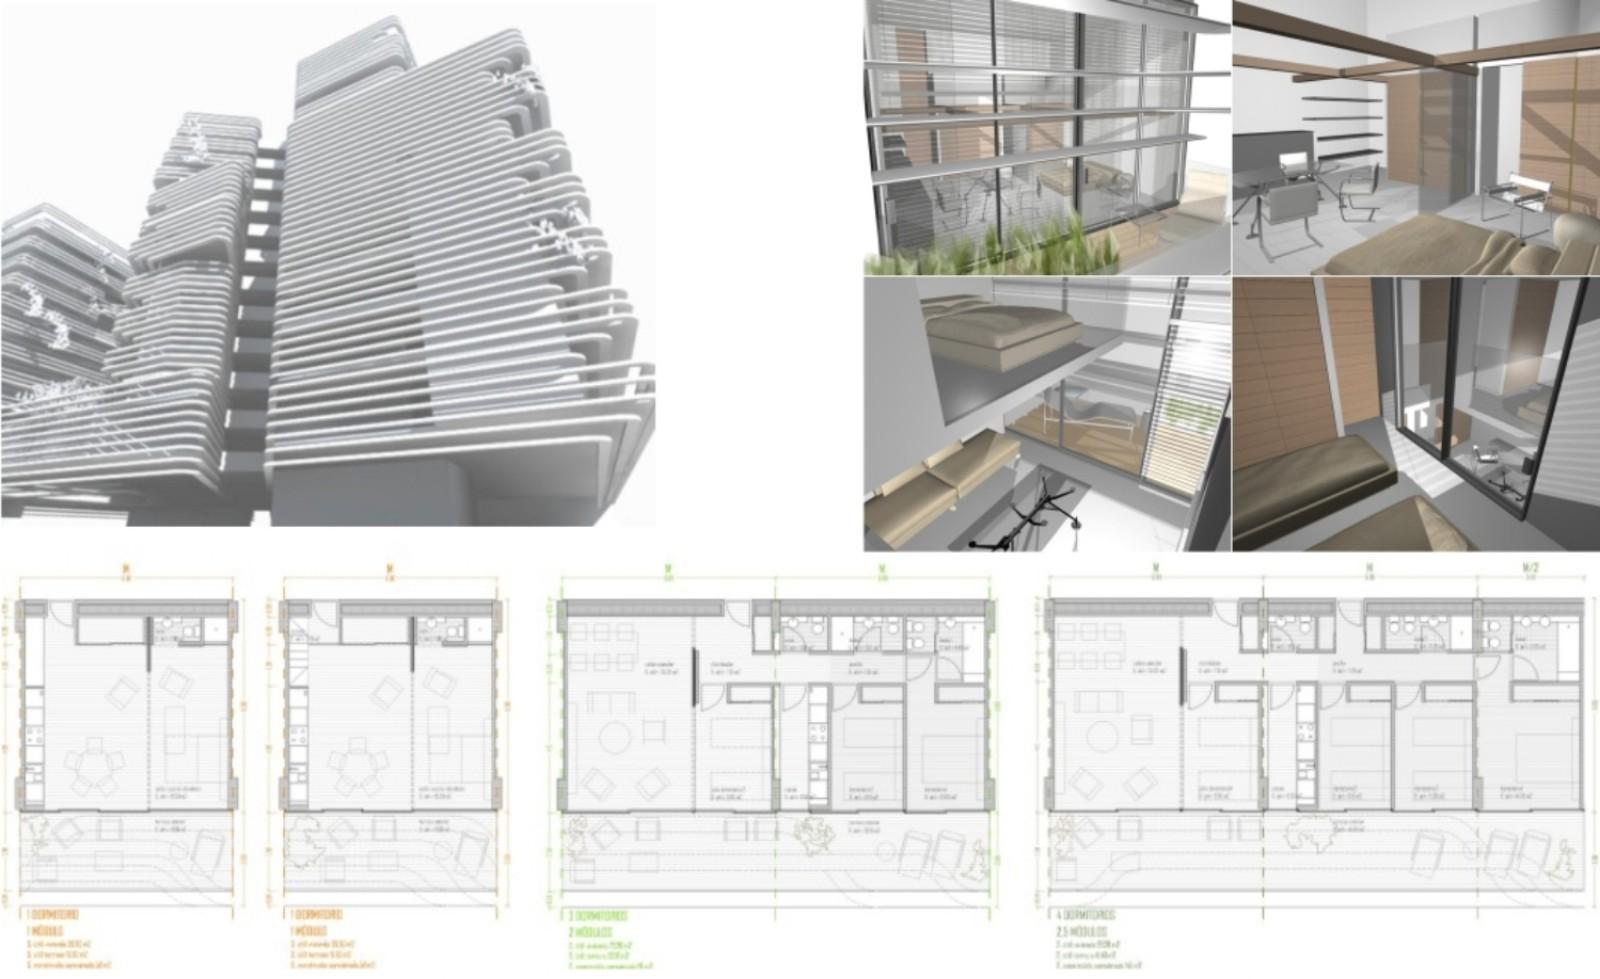 Bloque de viviendas u3 estudio de arquitectura madrid for Estudios arquitectura madrid